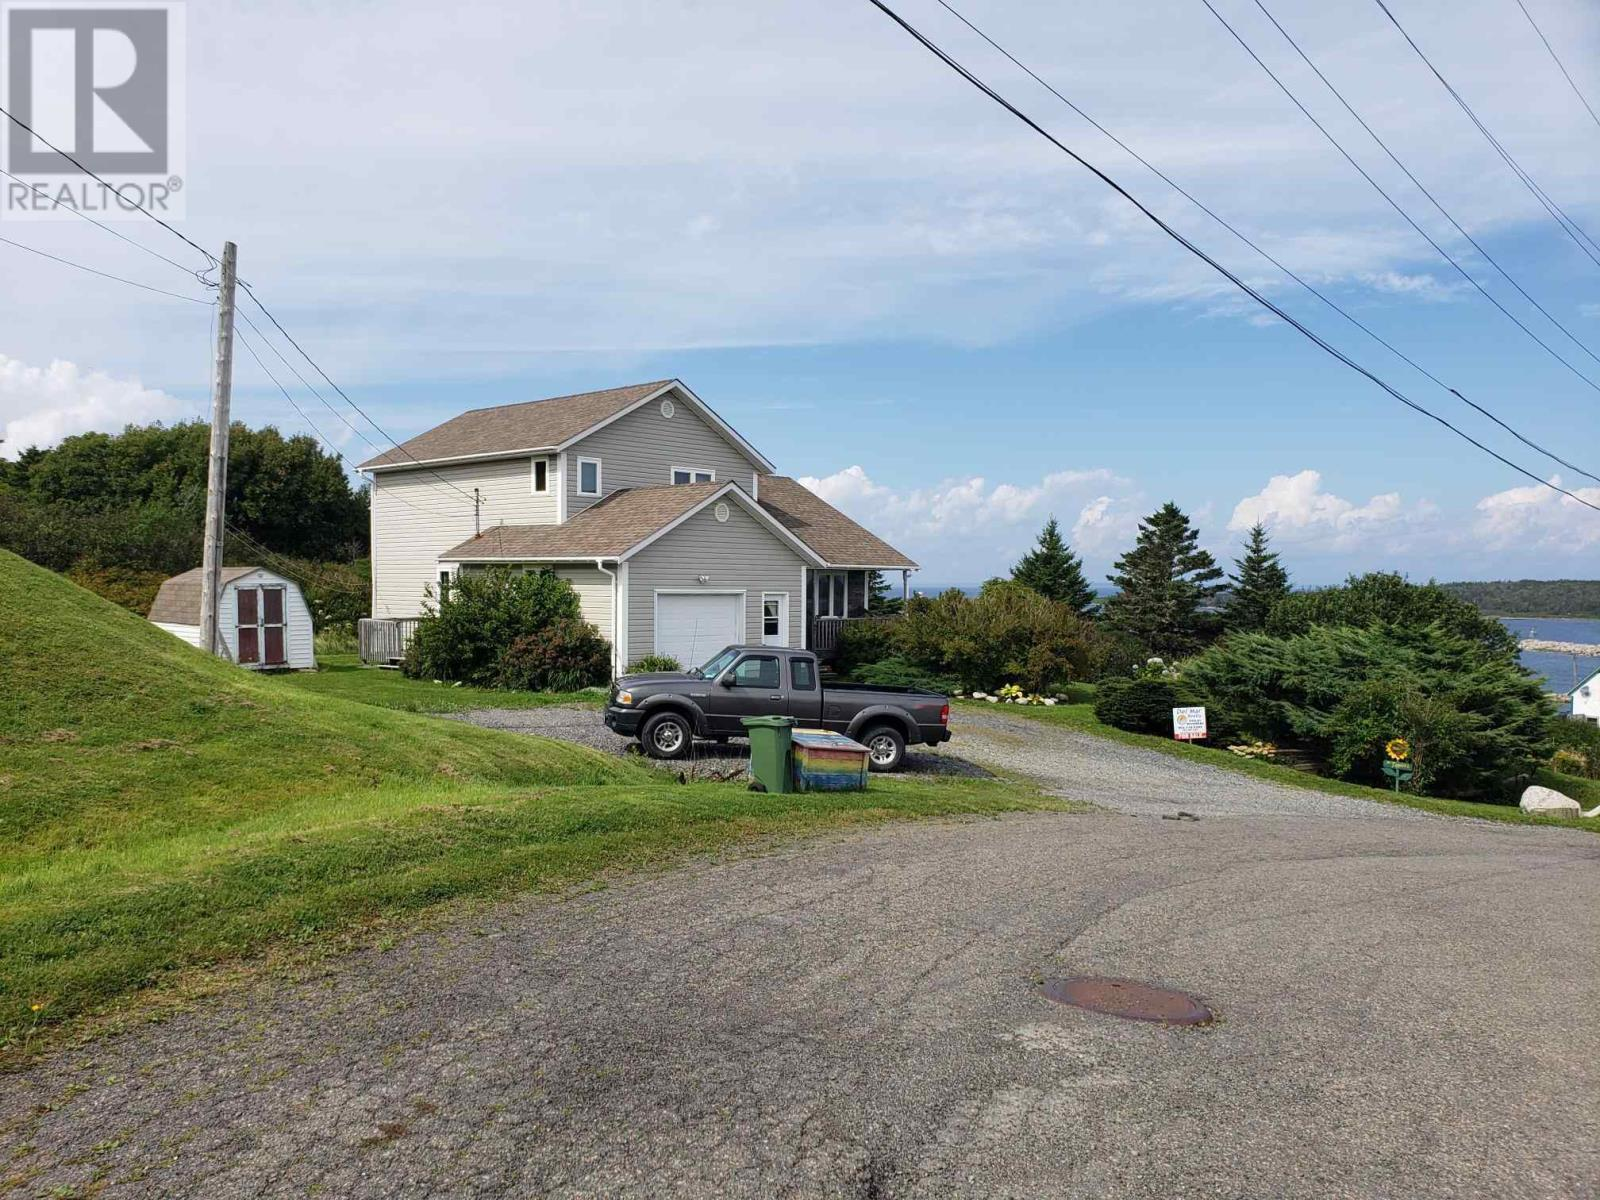 167 Wilmot Street, Canso, Nova Scotia  B0H 1H0 - Photo 1 - 201918573